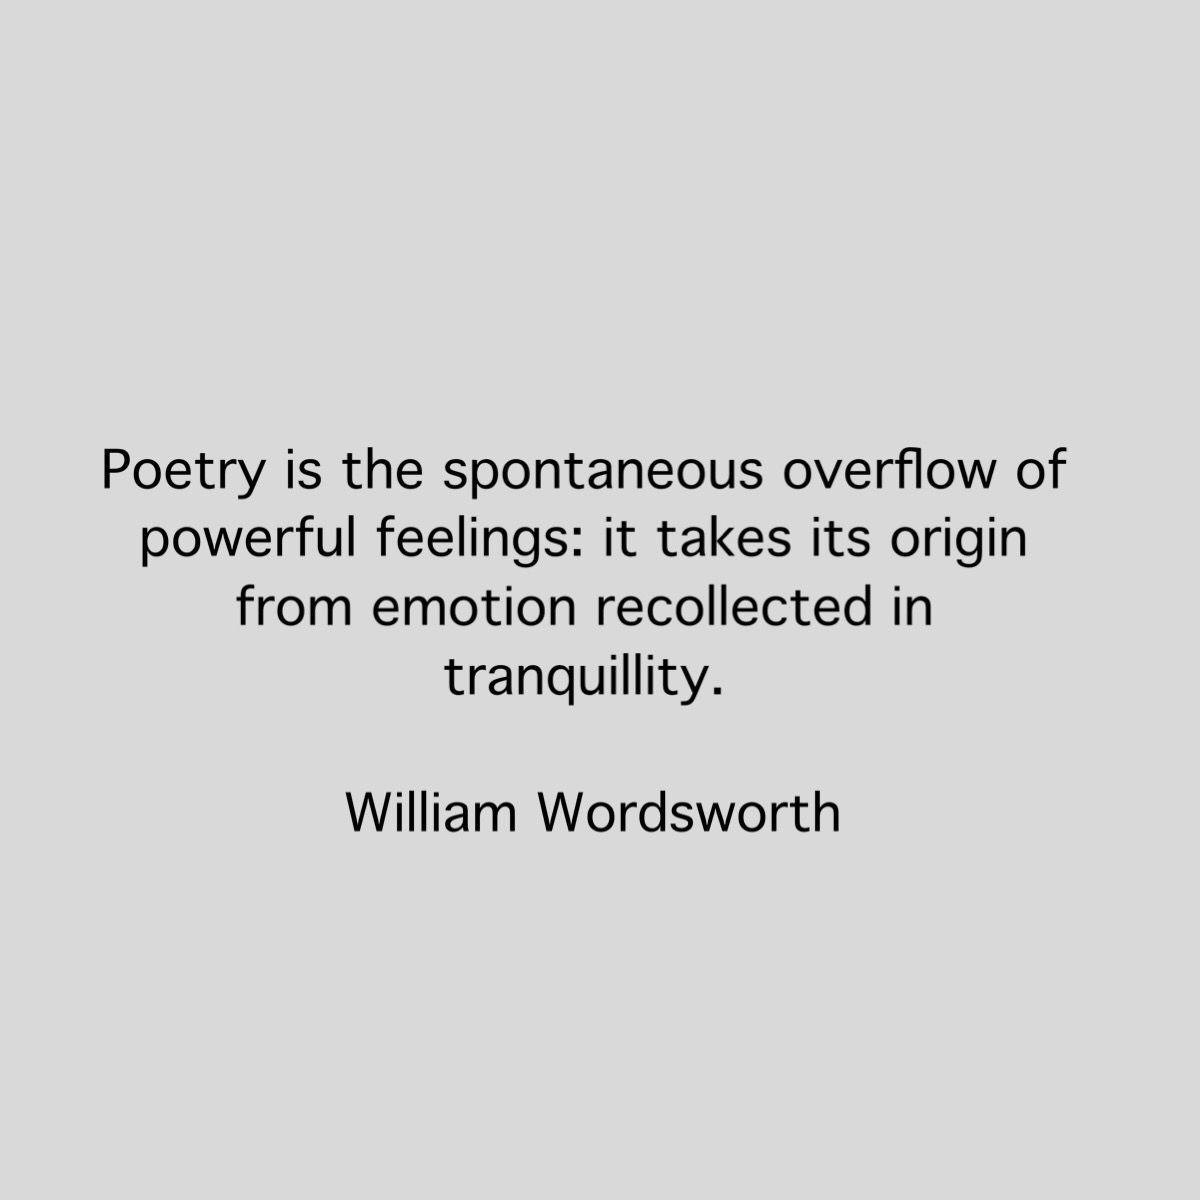 william wordsworth style of writing poems